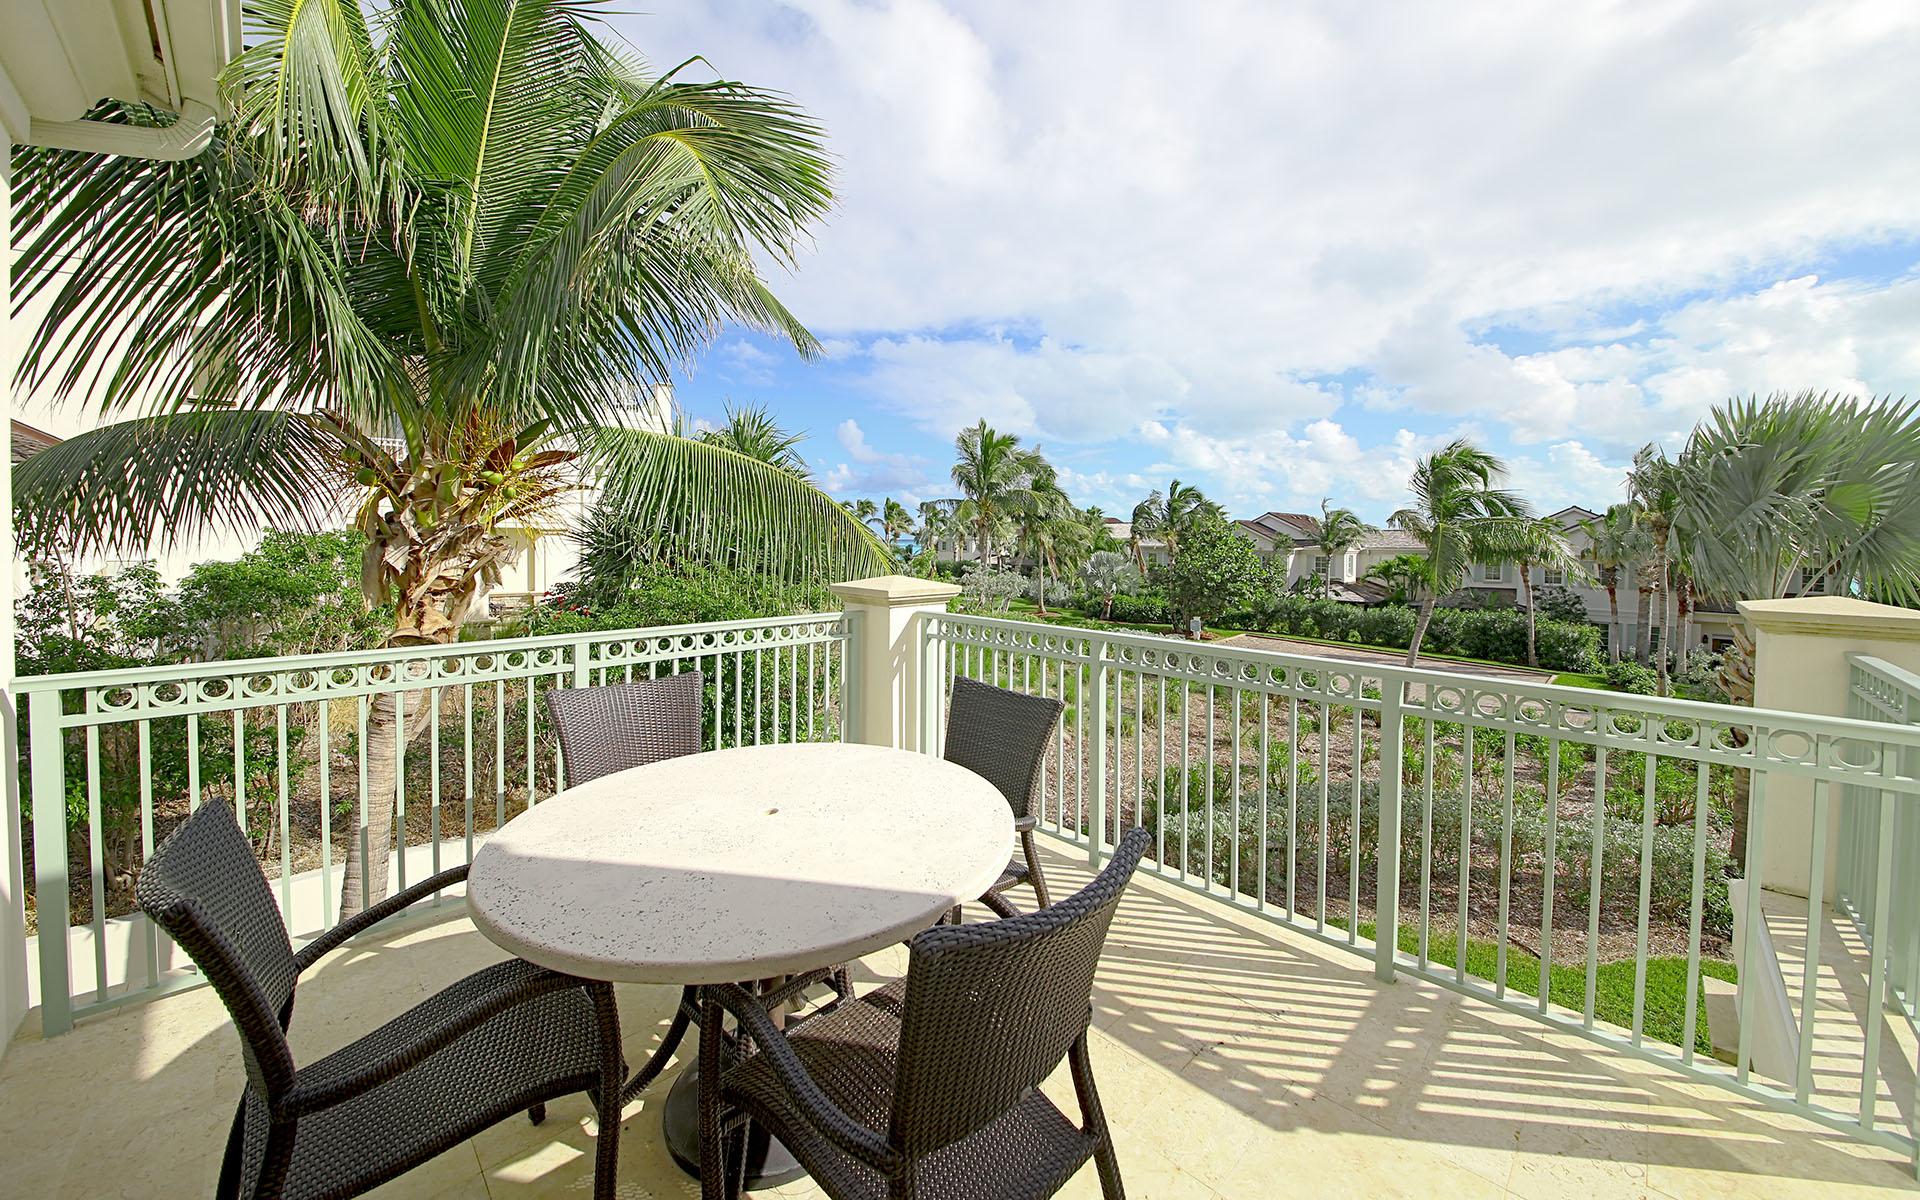 Co-op / Condo for Sale at Grand Isle Villa #3101 - MLS 32104 Emerald Bay, Exuma, Bahamas